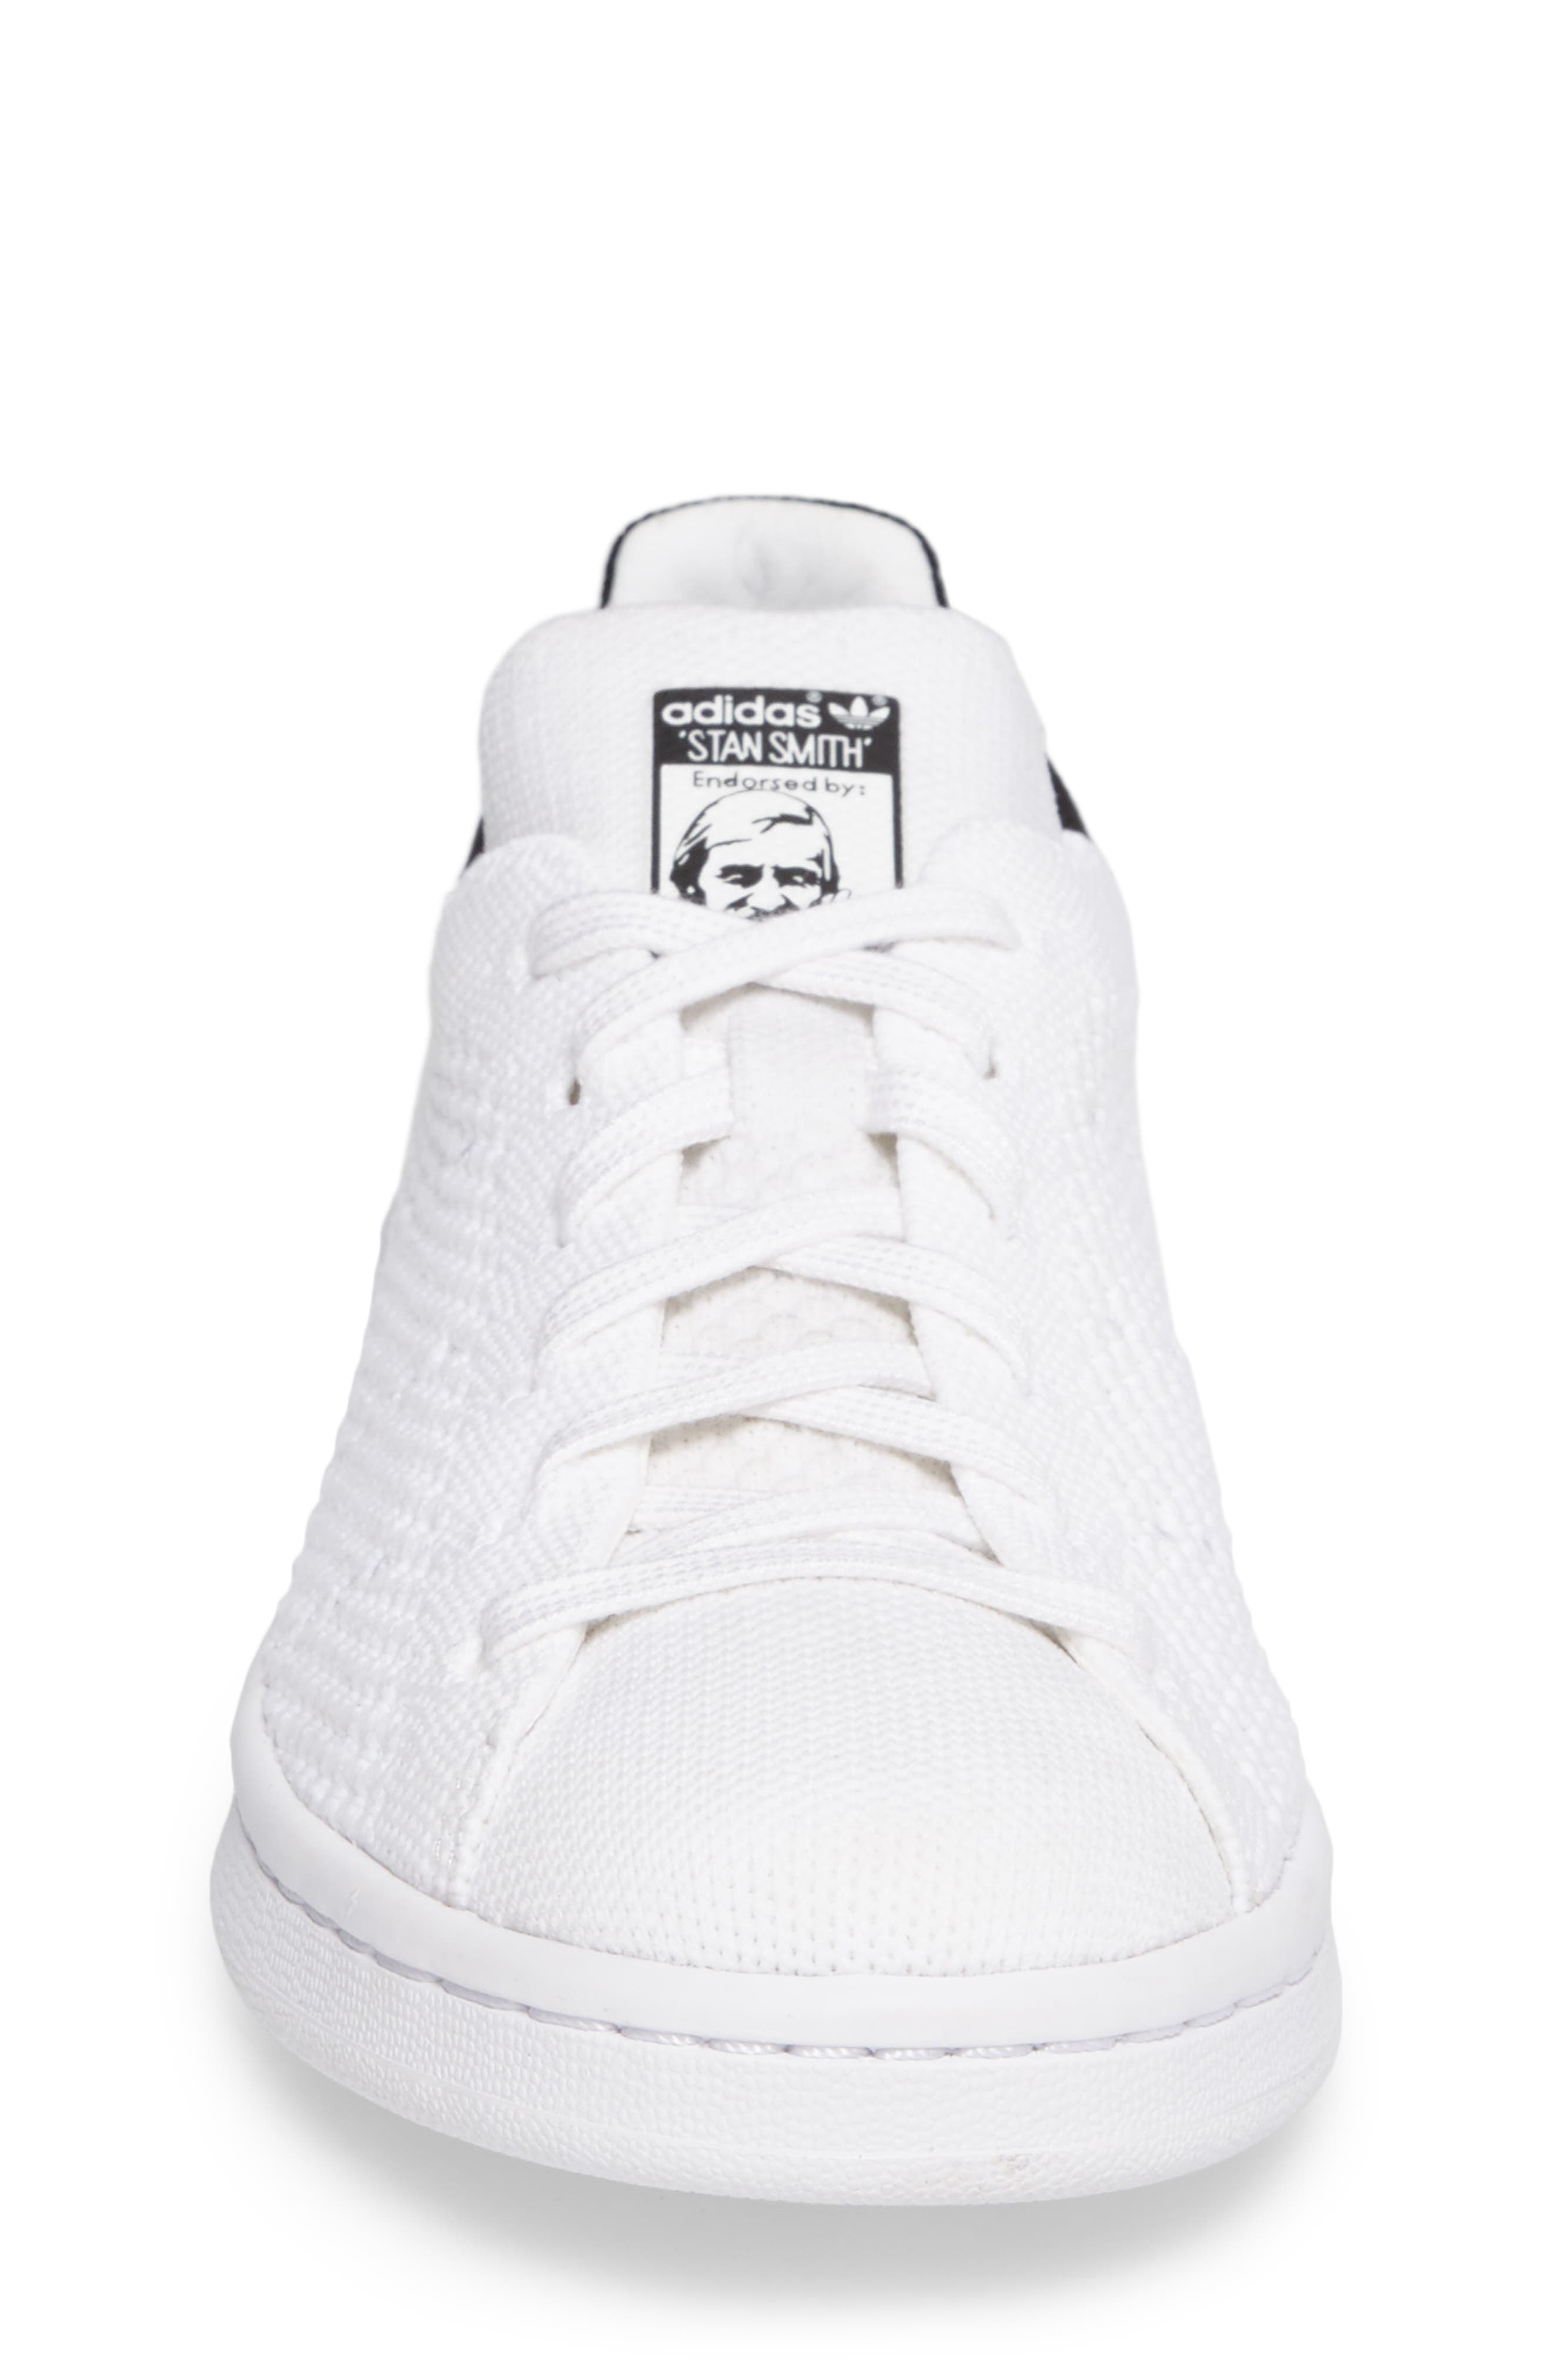 Stan Smith Primeknit Sneaker,                             Alternate thumbnail 4, color,                             Footwear White